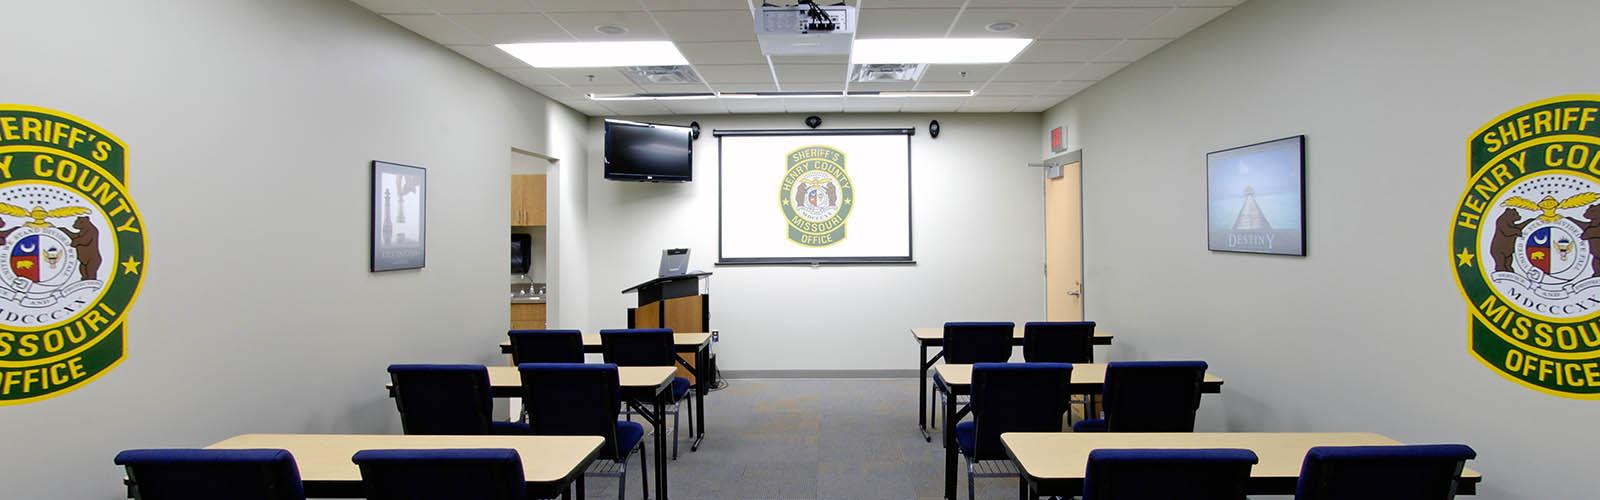 Henry County Detention Center 5